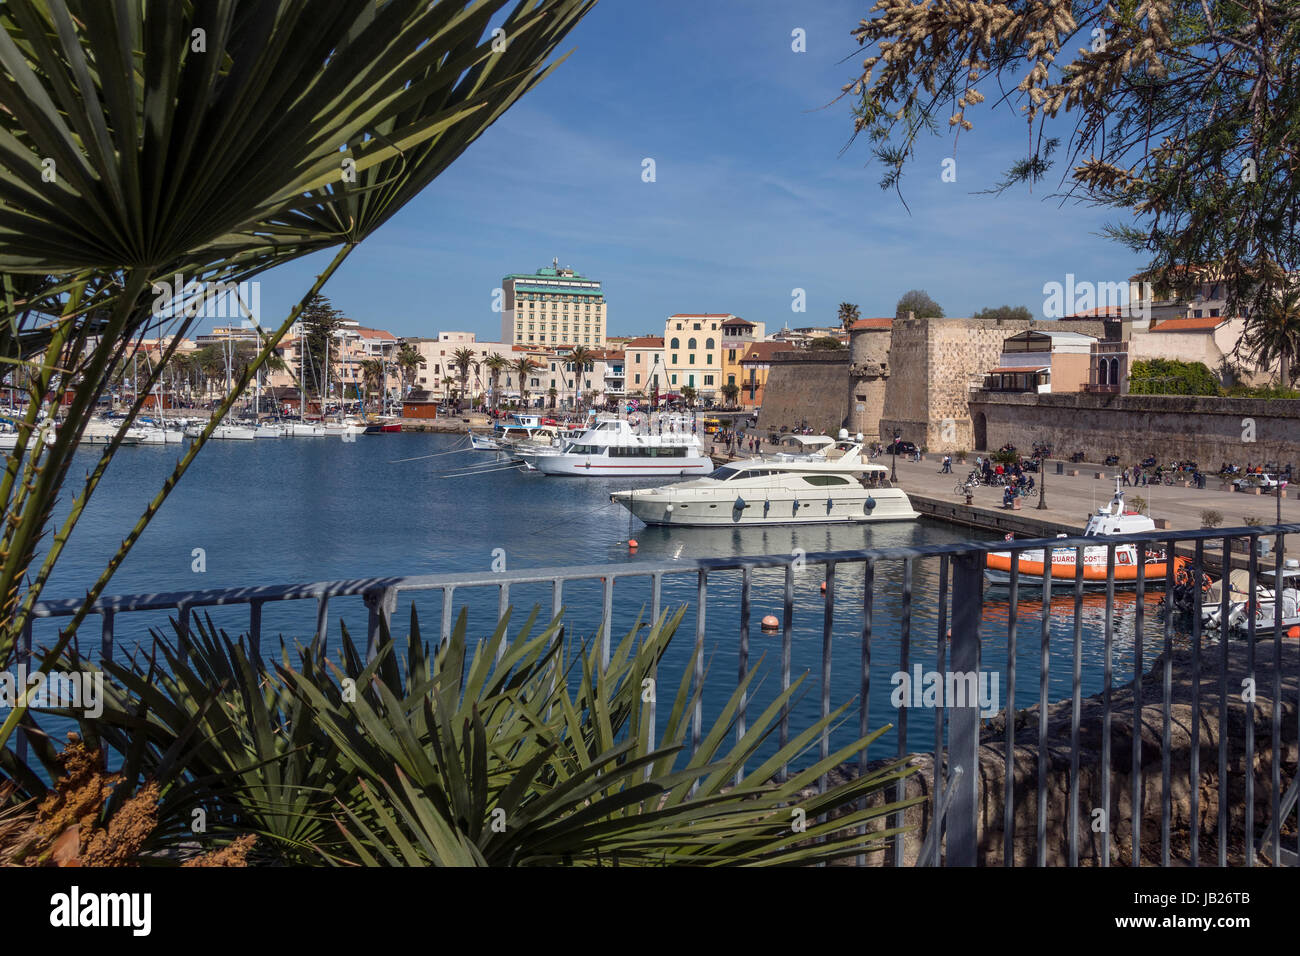 The port of Alghero in the province of Sassari on the northwest coast of the island of Sardinia, Italy. - Stock Image